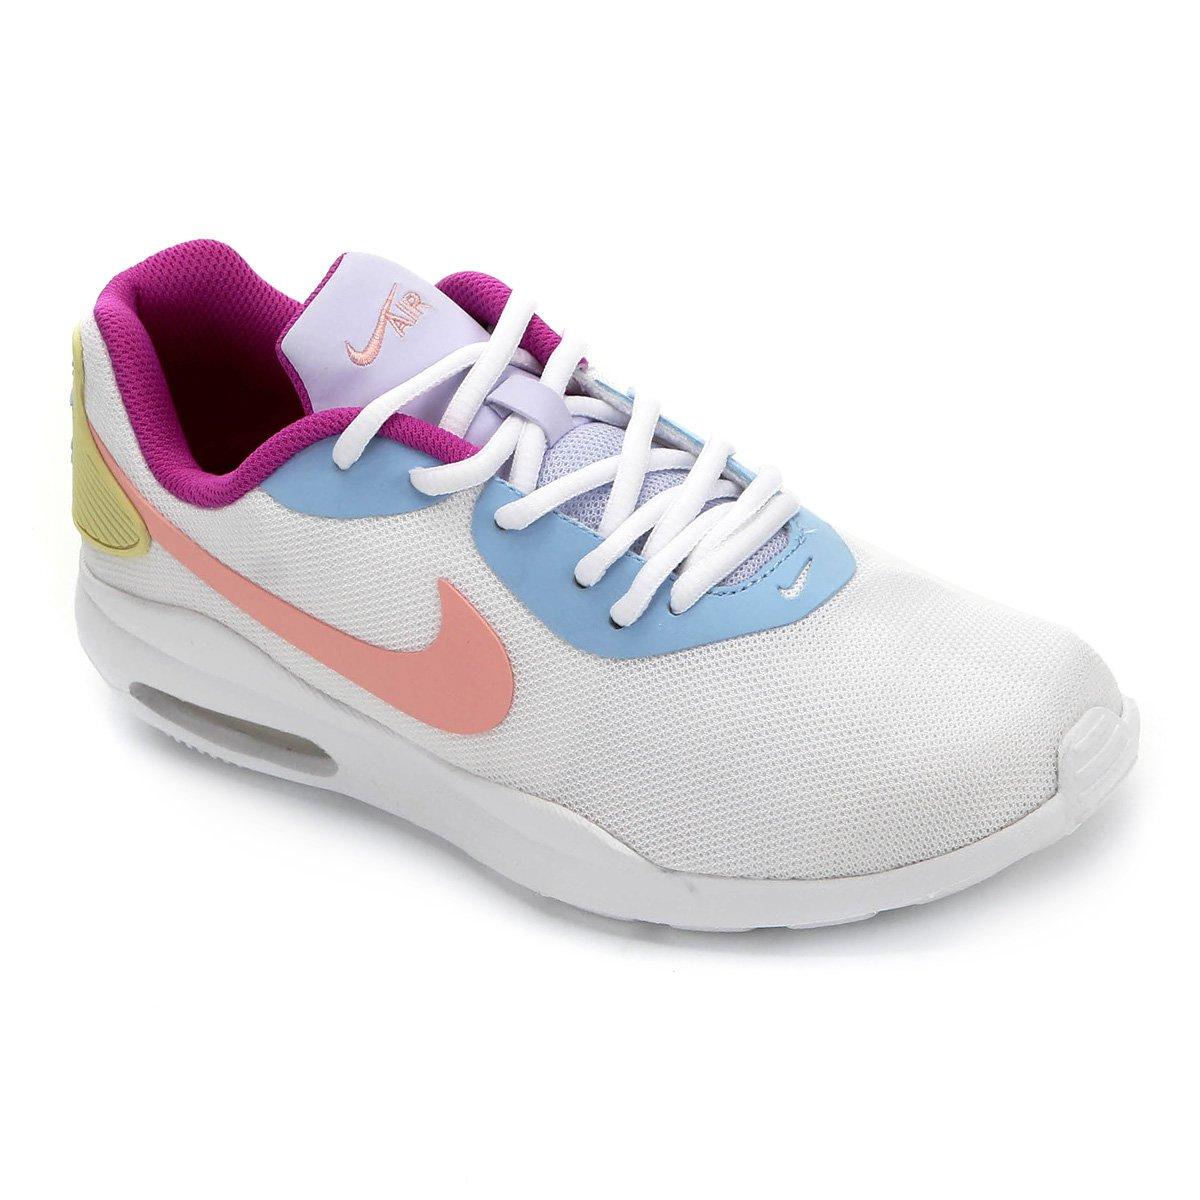 Tênis Nike Air Max Oketo Feminino Branco E Roxo